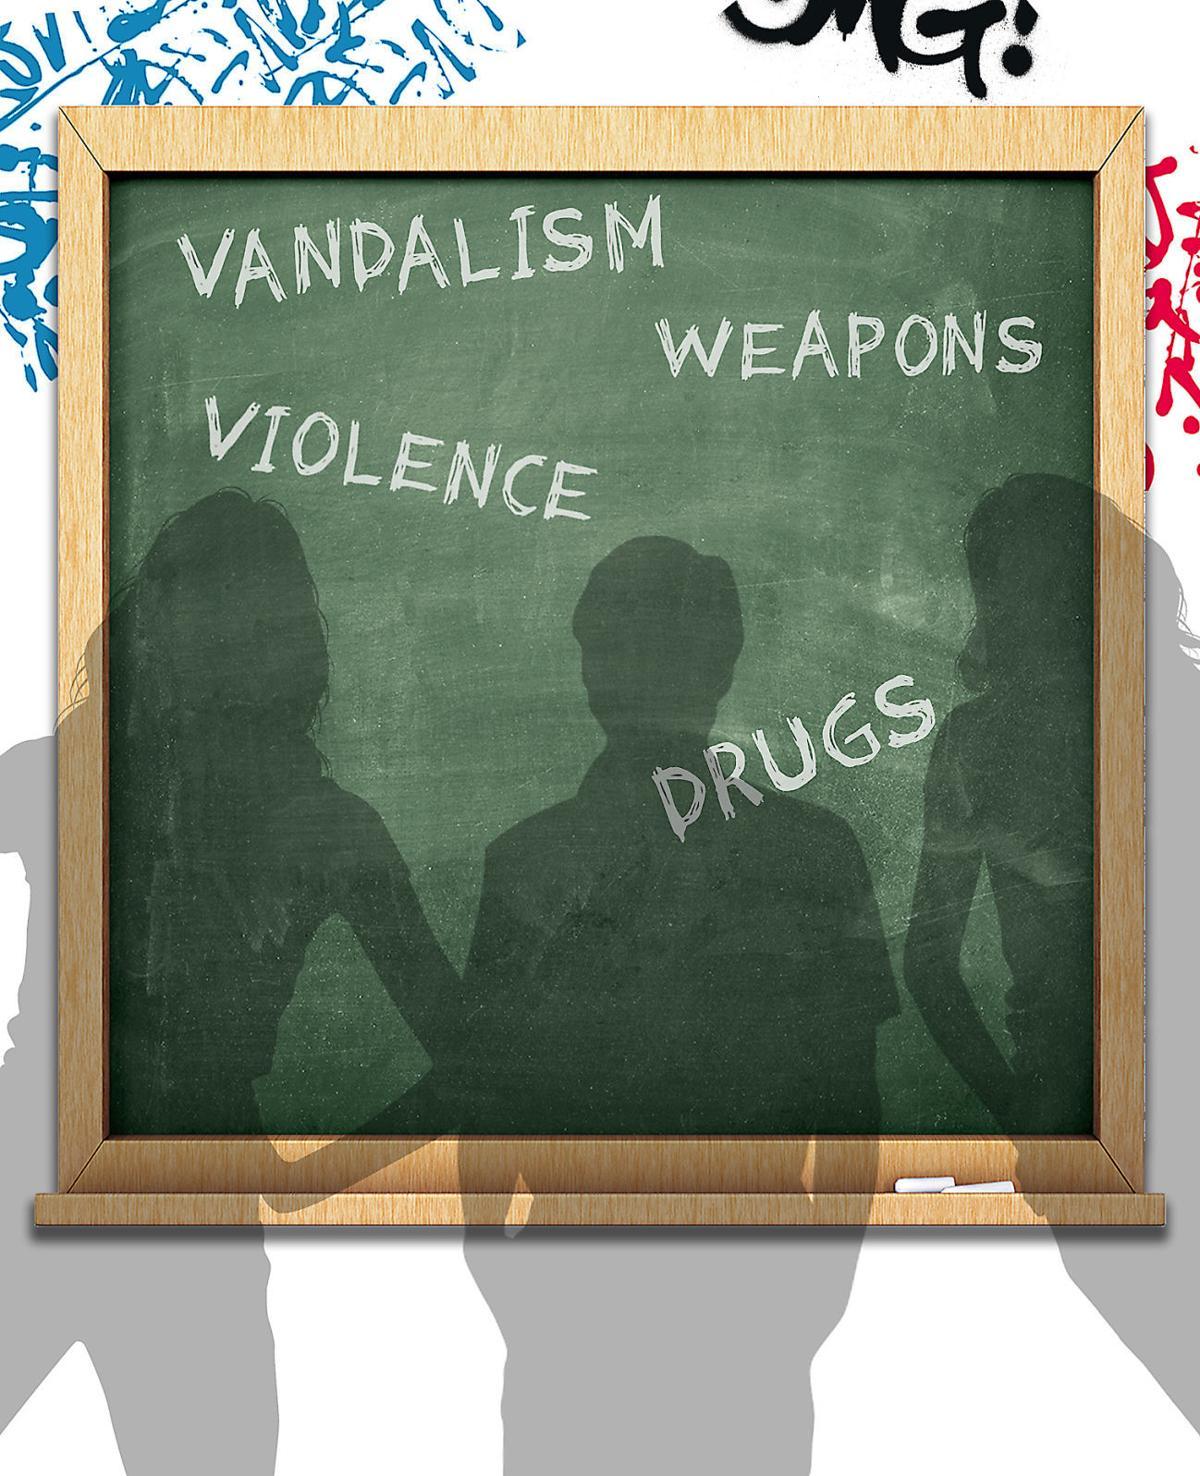 School violence illustration